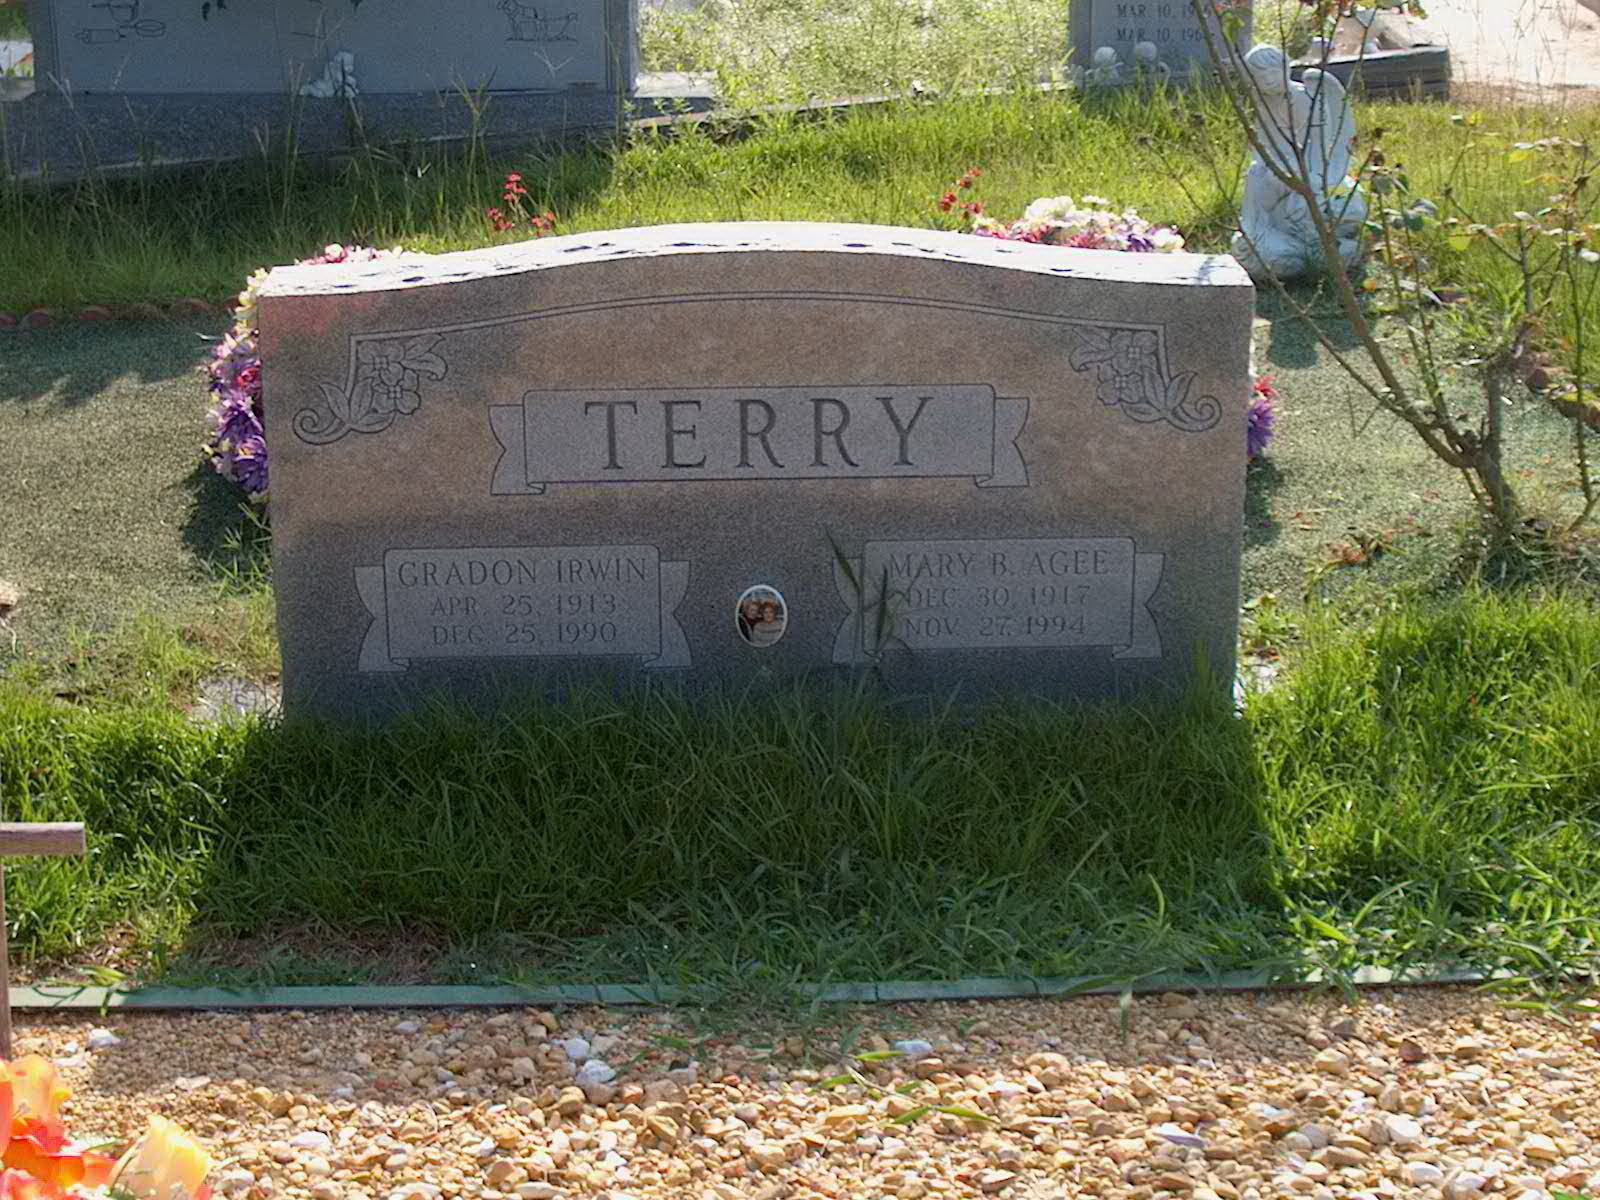 Gradon Irwin Terry